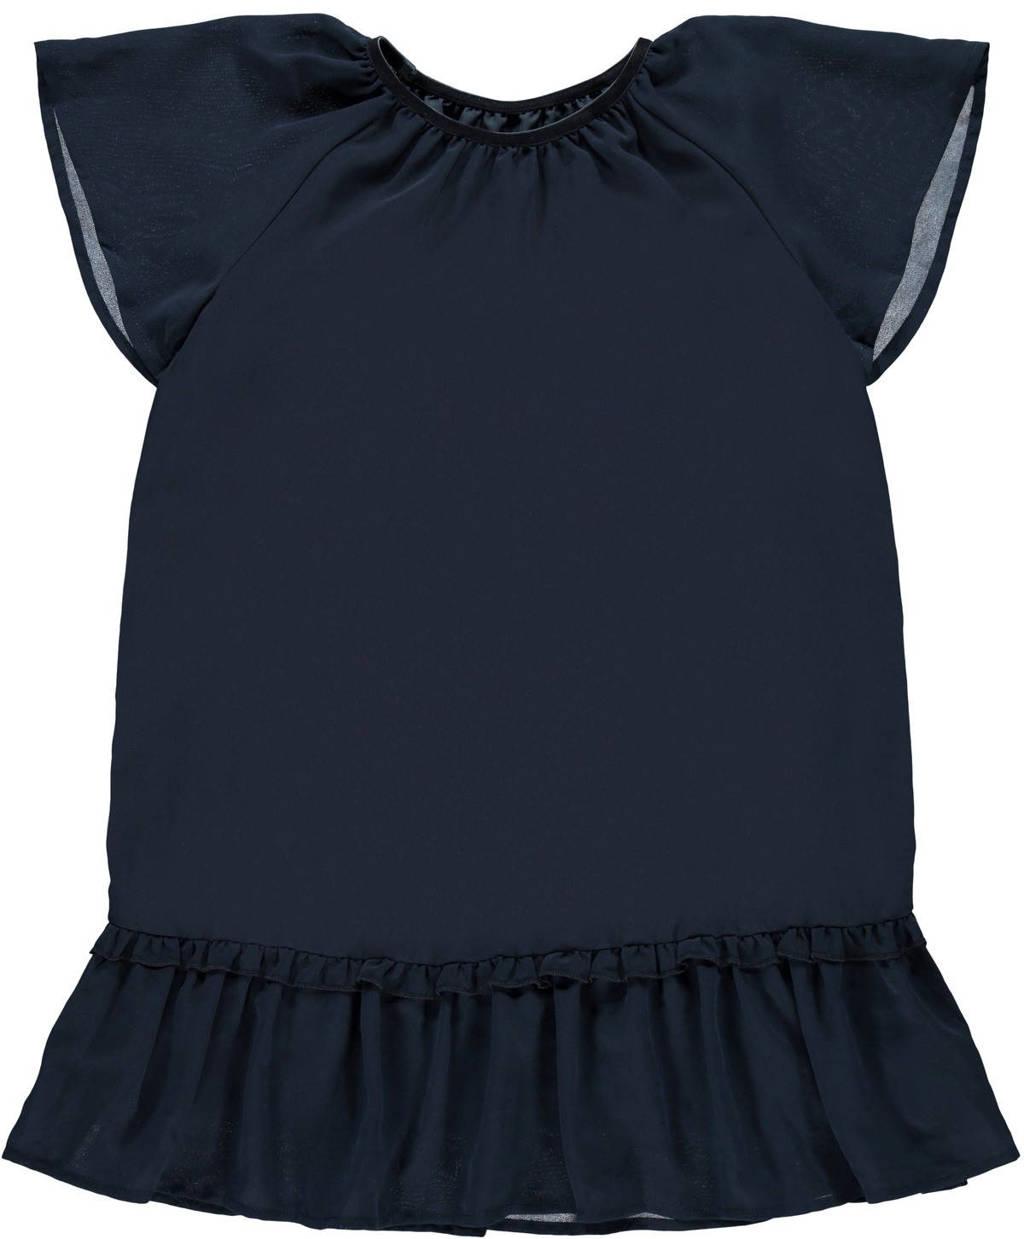 NAME IT KIDS jurk Ritaka van gerecycled polyester donkerblauw, Donkerblauw